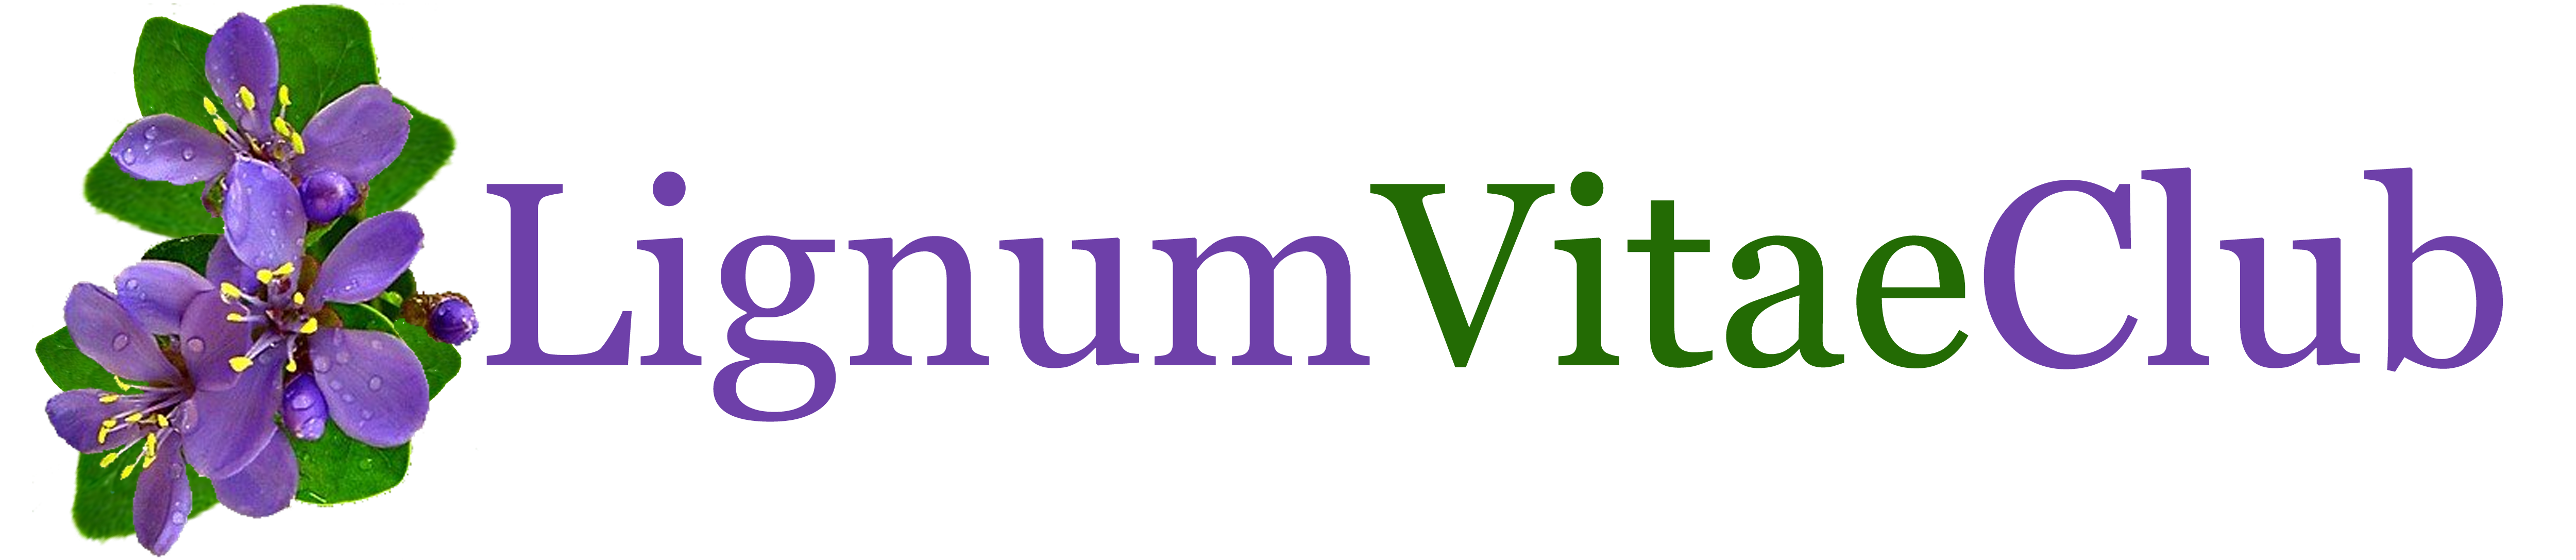 Lignum Vitae Club